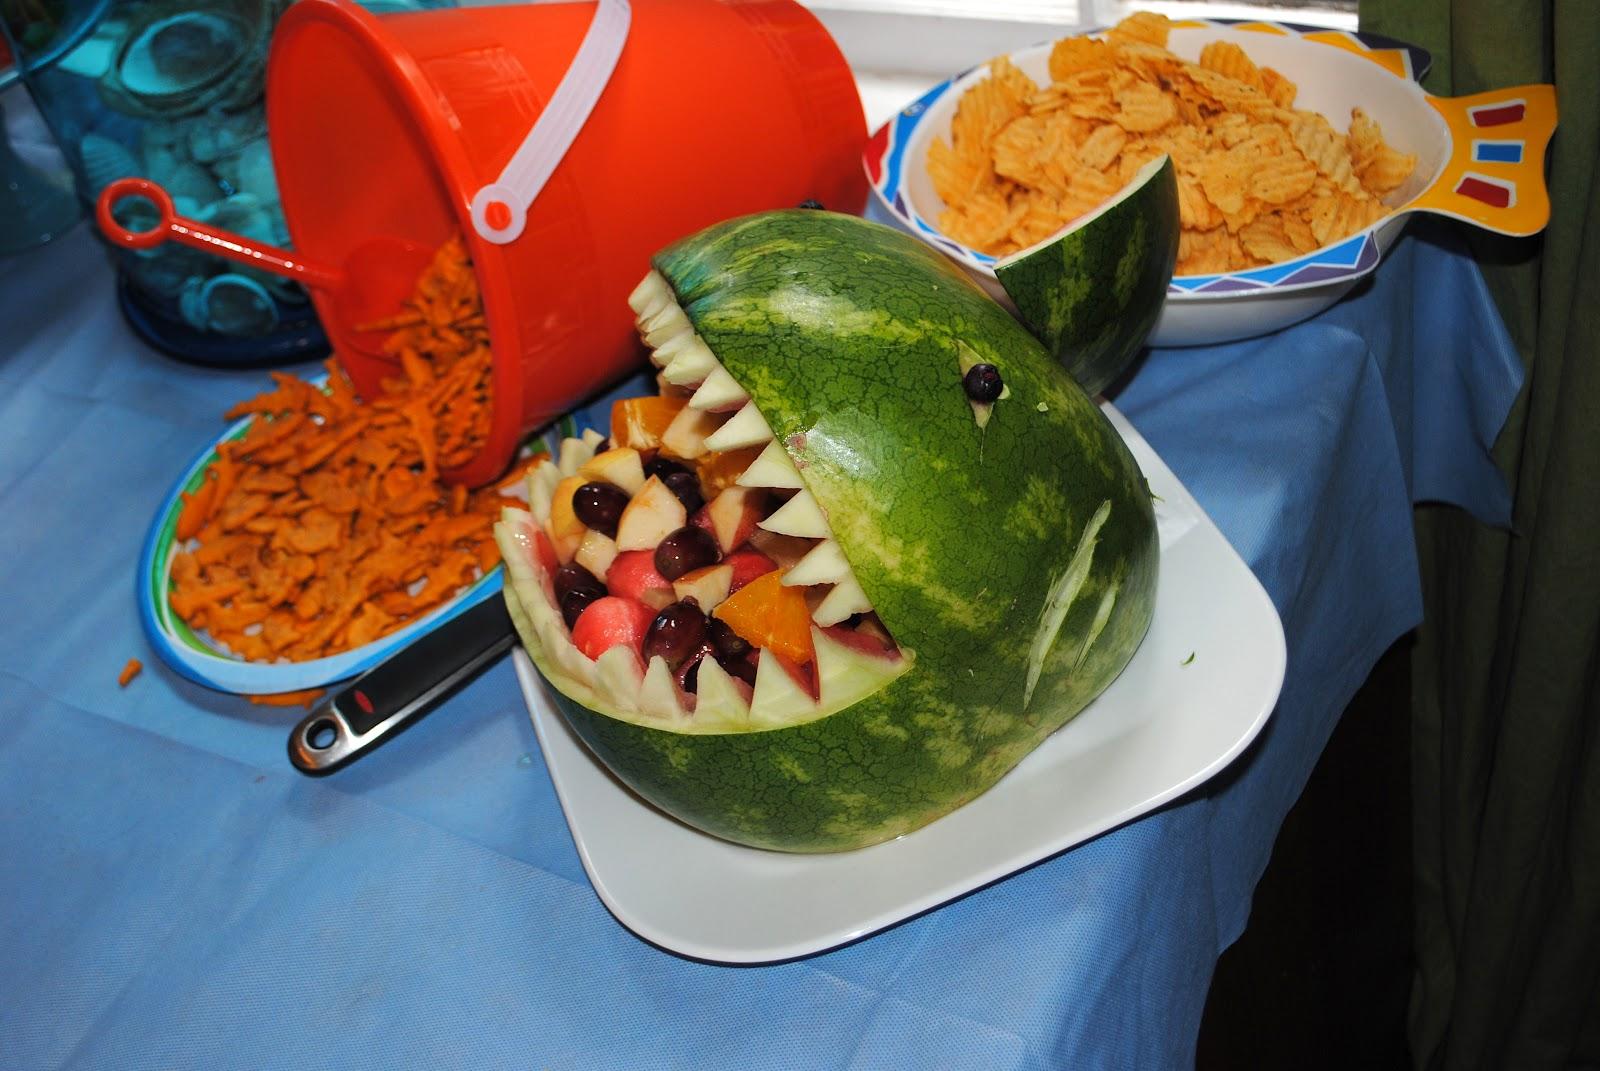 Sugartotdesigns under the sea party